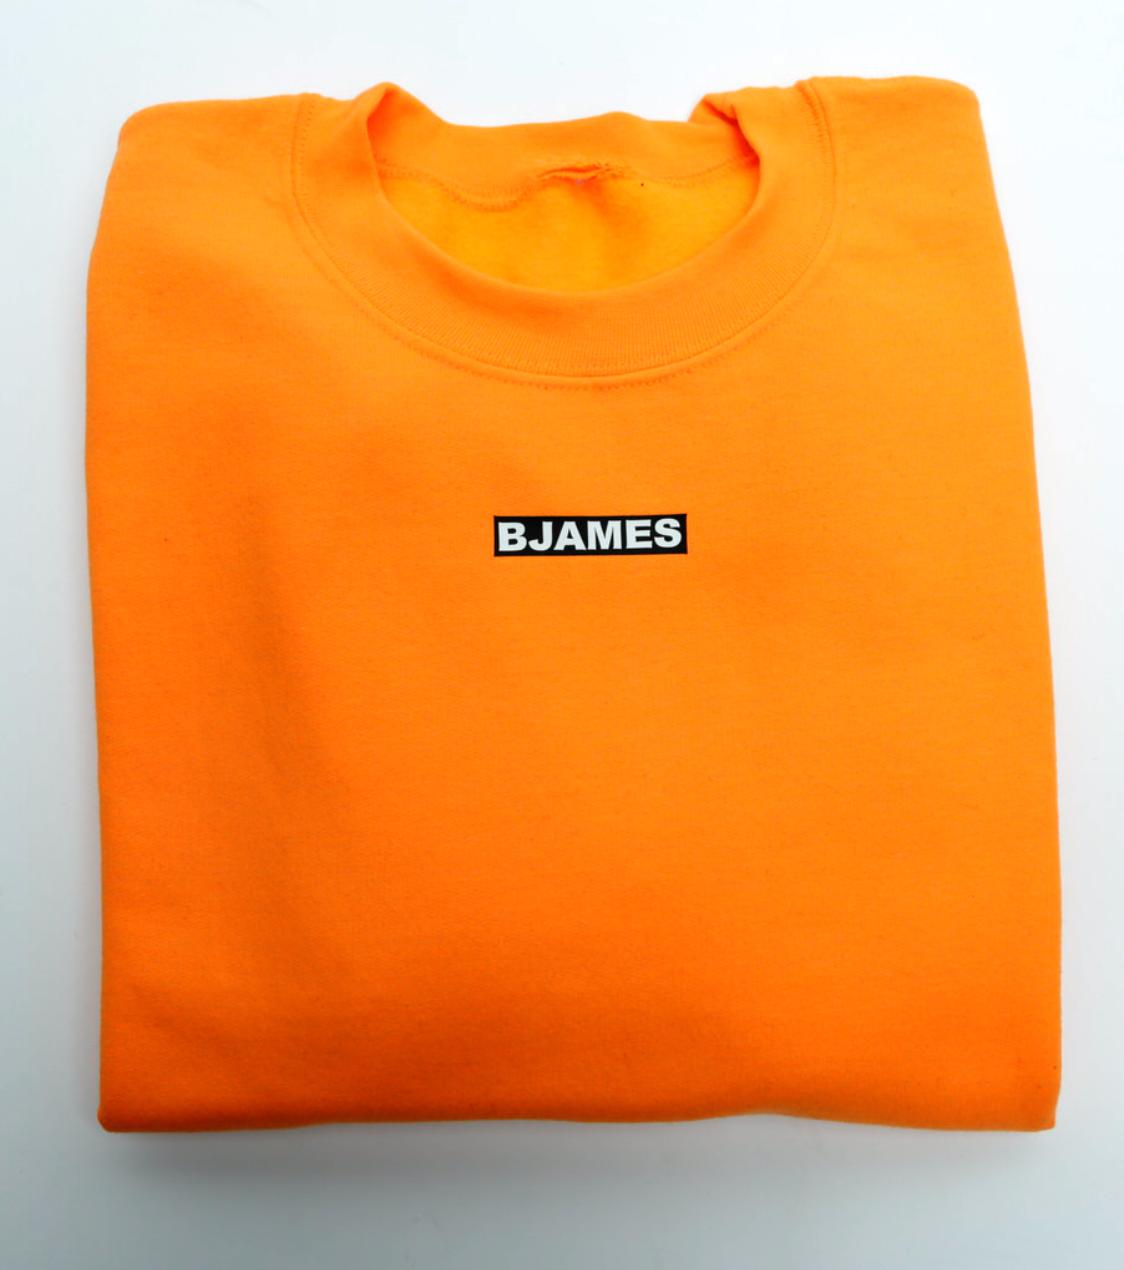 B JAMES BASIC CREW